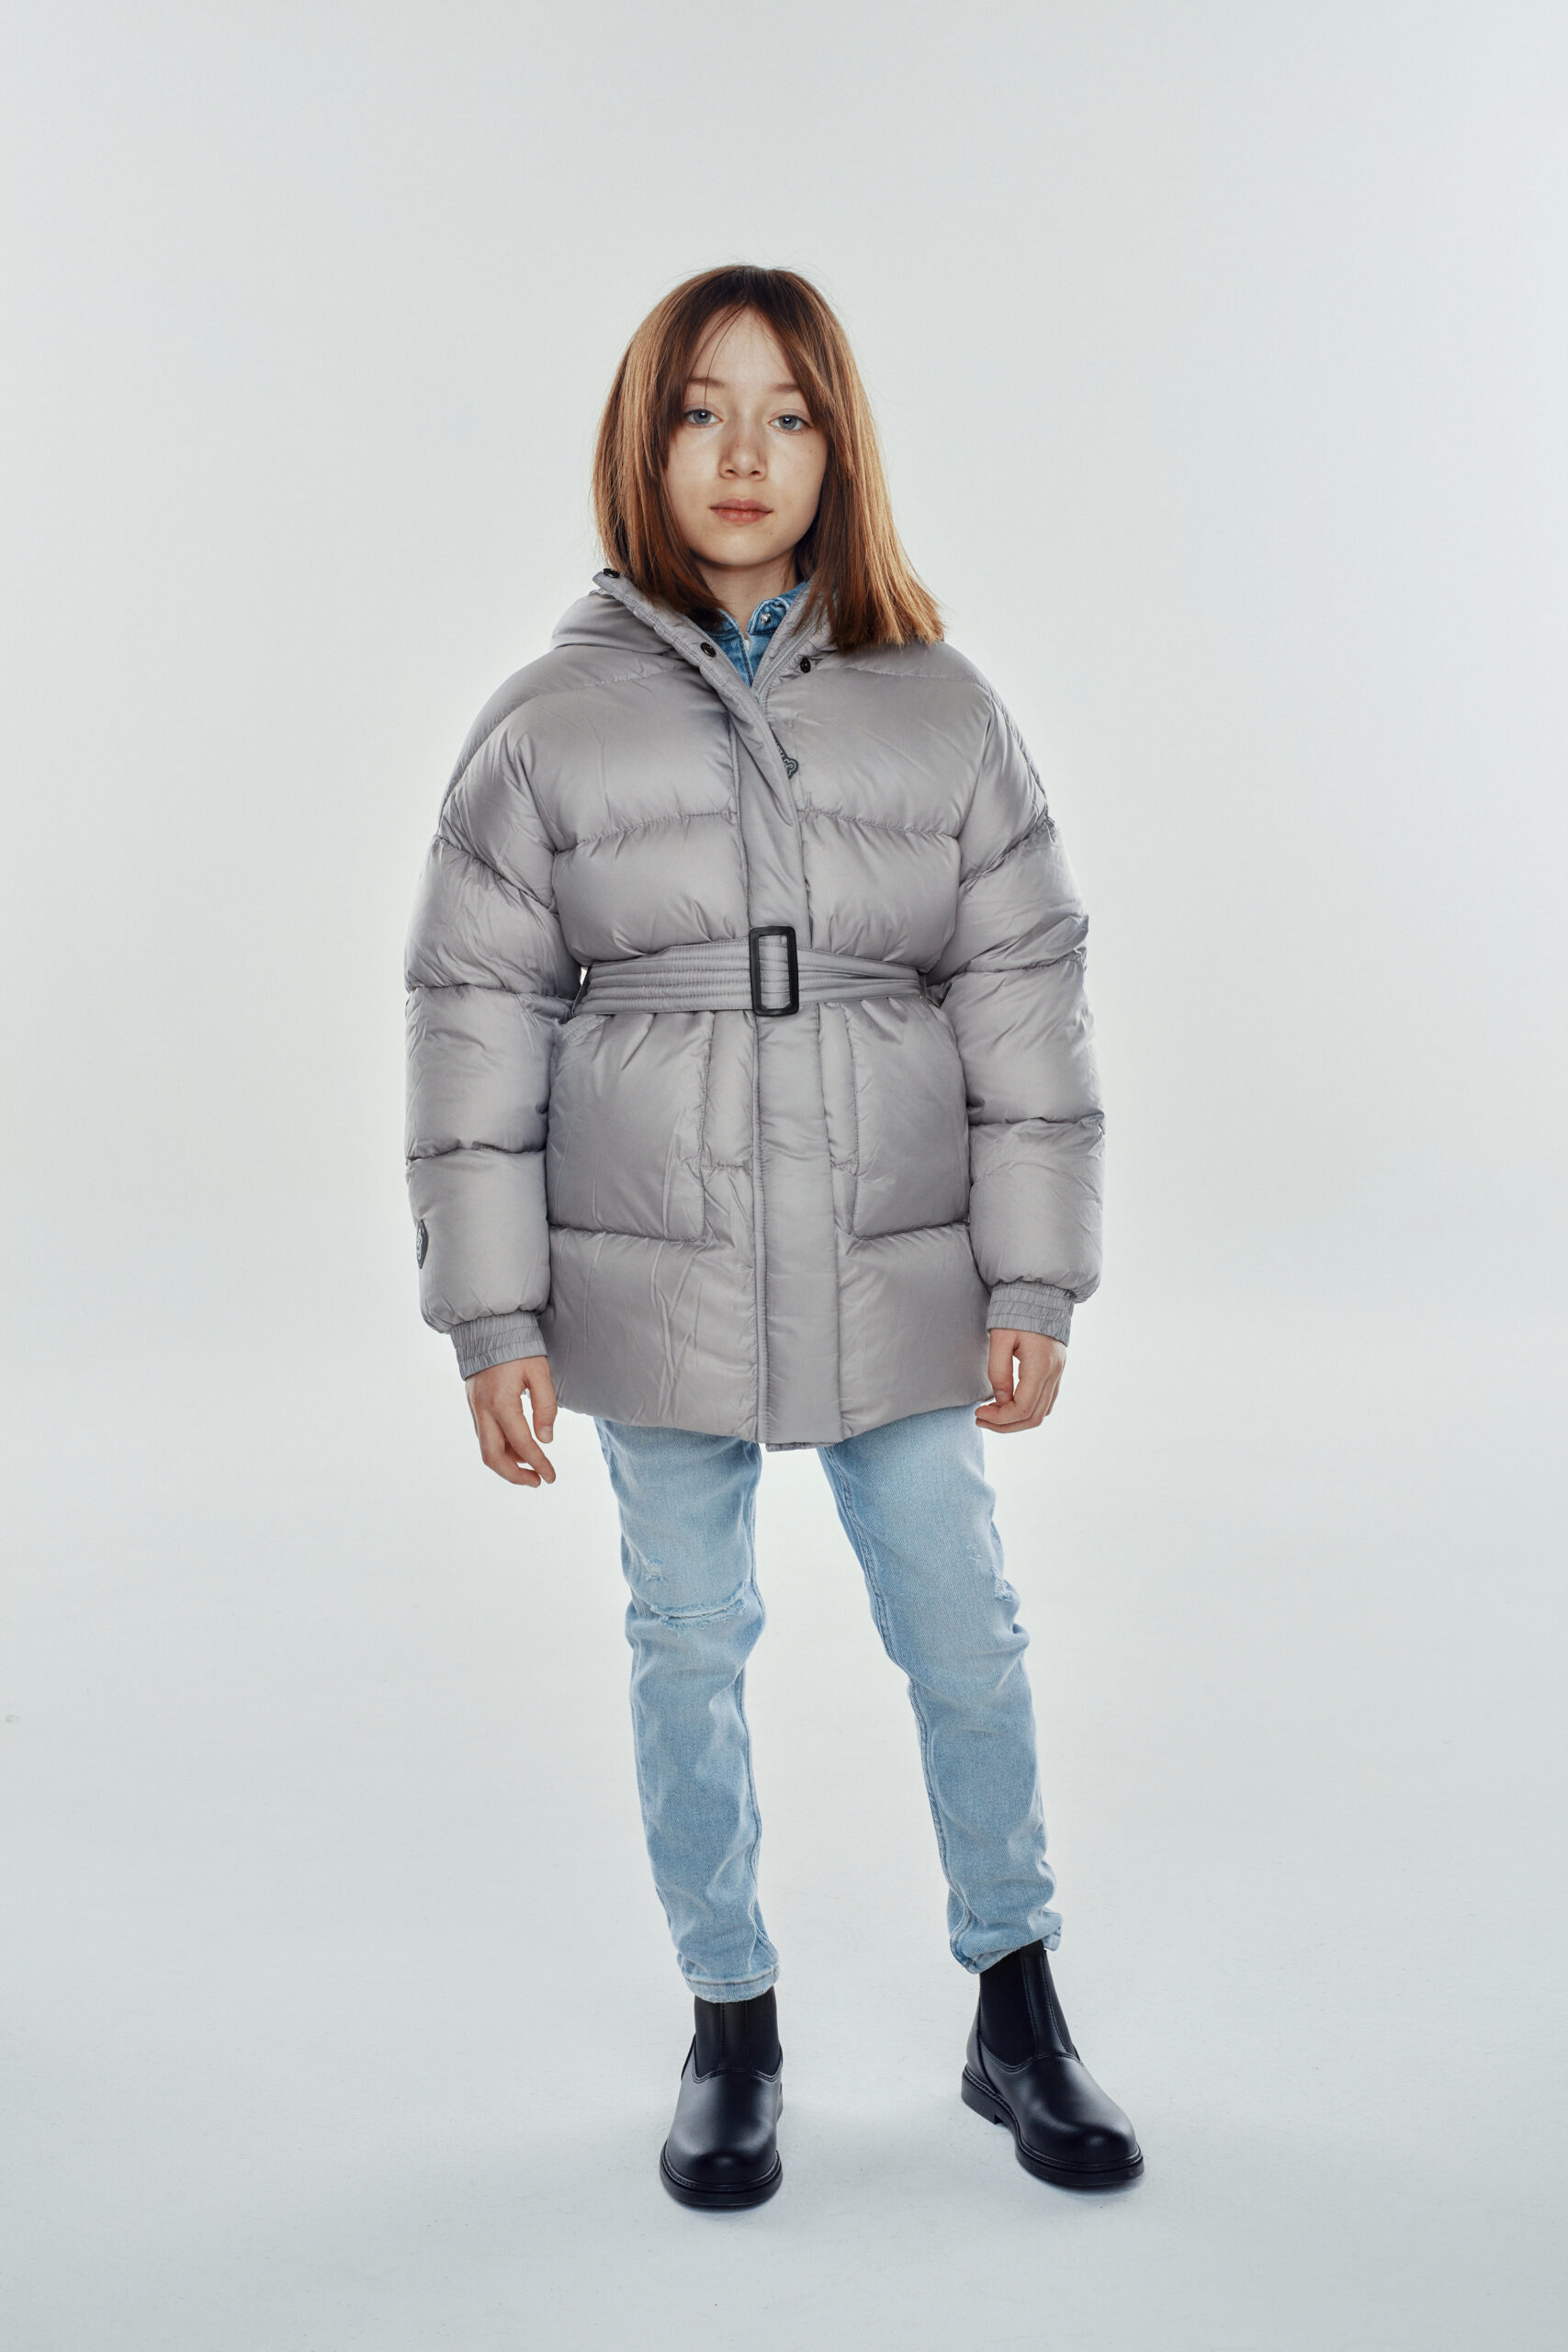 military kid light grey